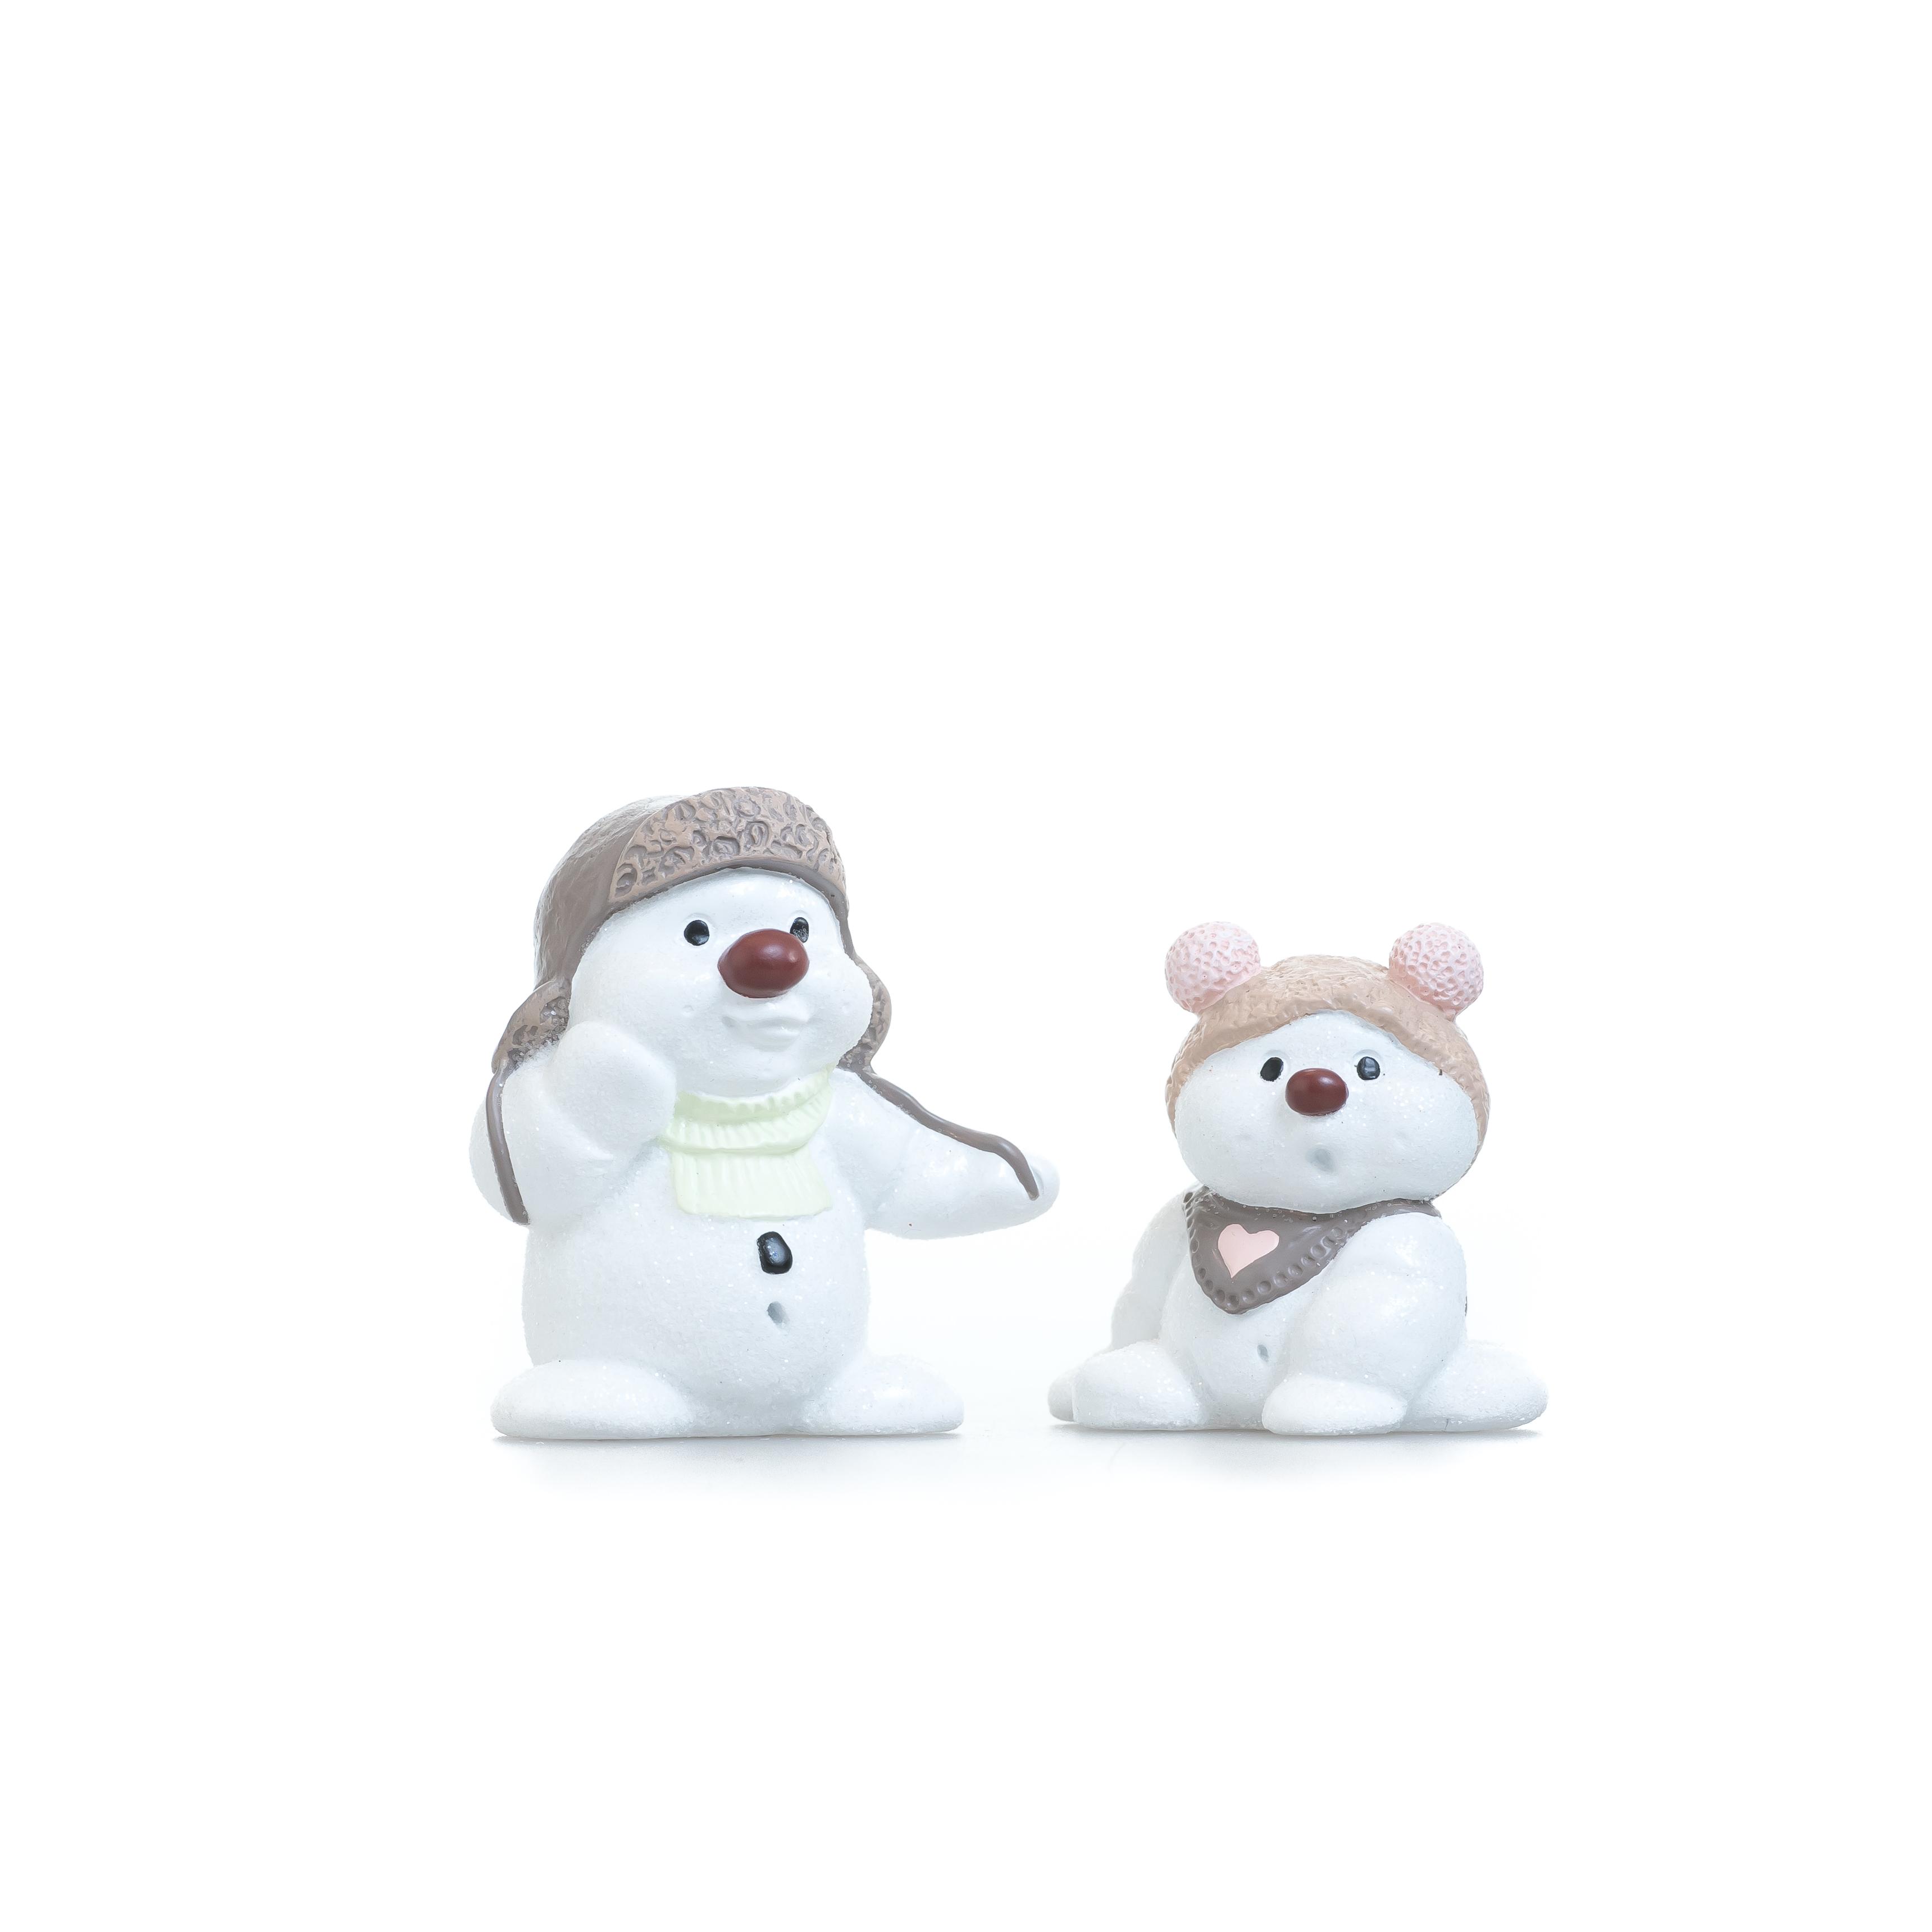 Klarborgnisser - Ejlif & Effi Snowmen 2016 (93093)